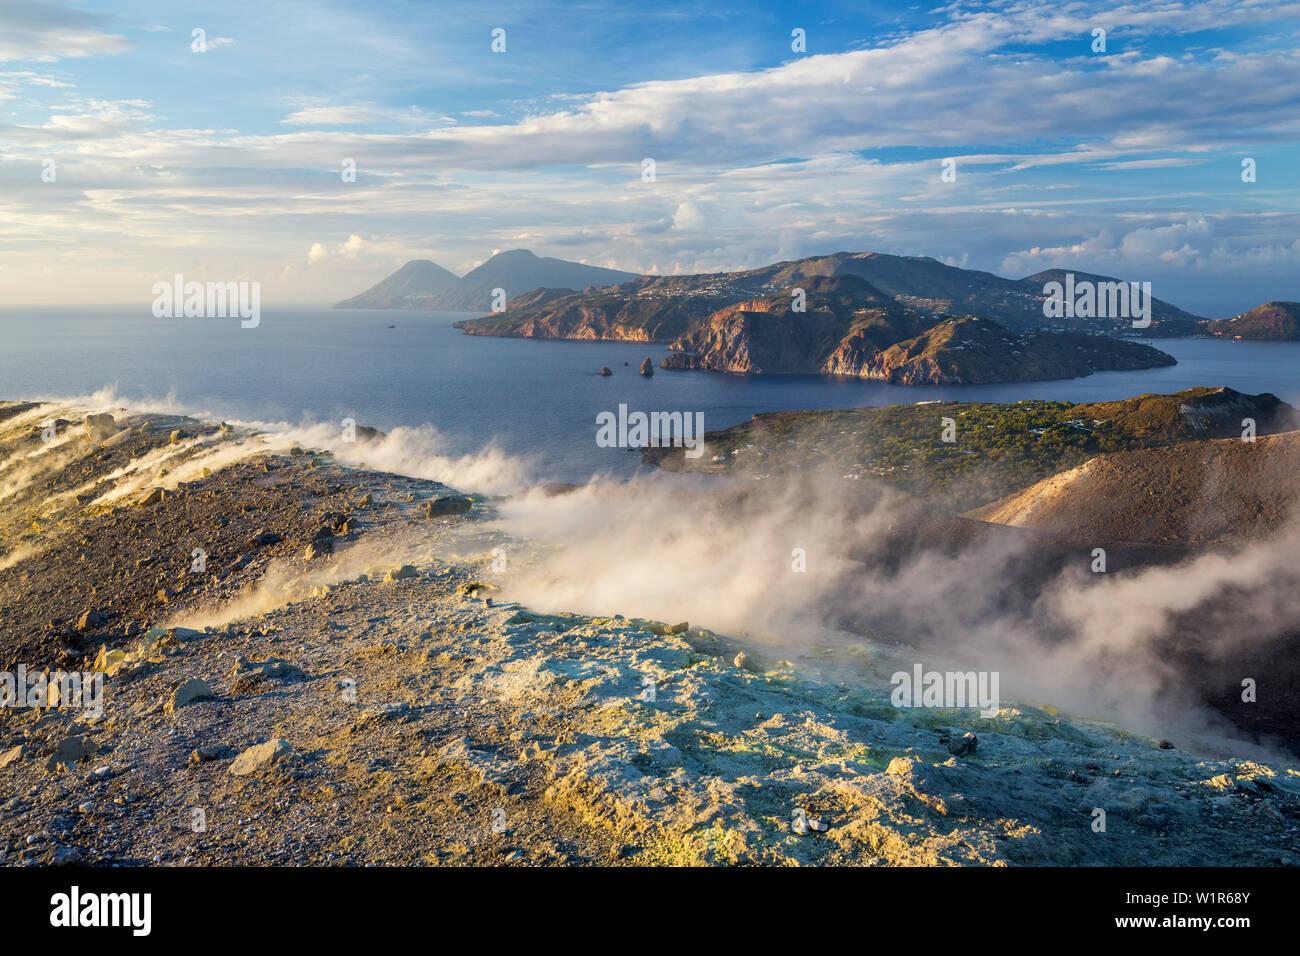 Sulfur on the crater rim of Gran Cratere, view from Vulcano Island to Salina and Lipari, Lipari Islands, Aeolian Islands, Tyrrhenian Sea, Mediterranea Stock Photo